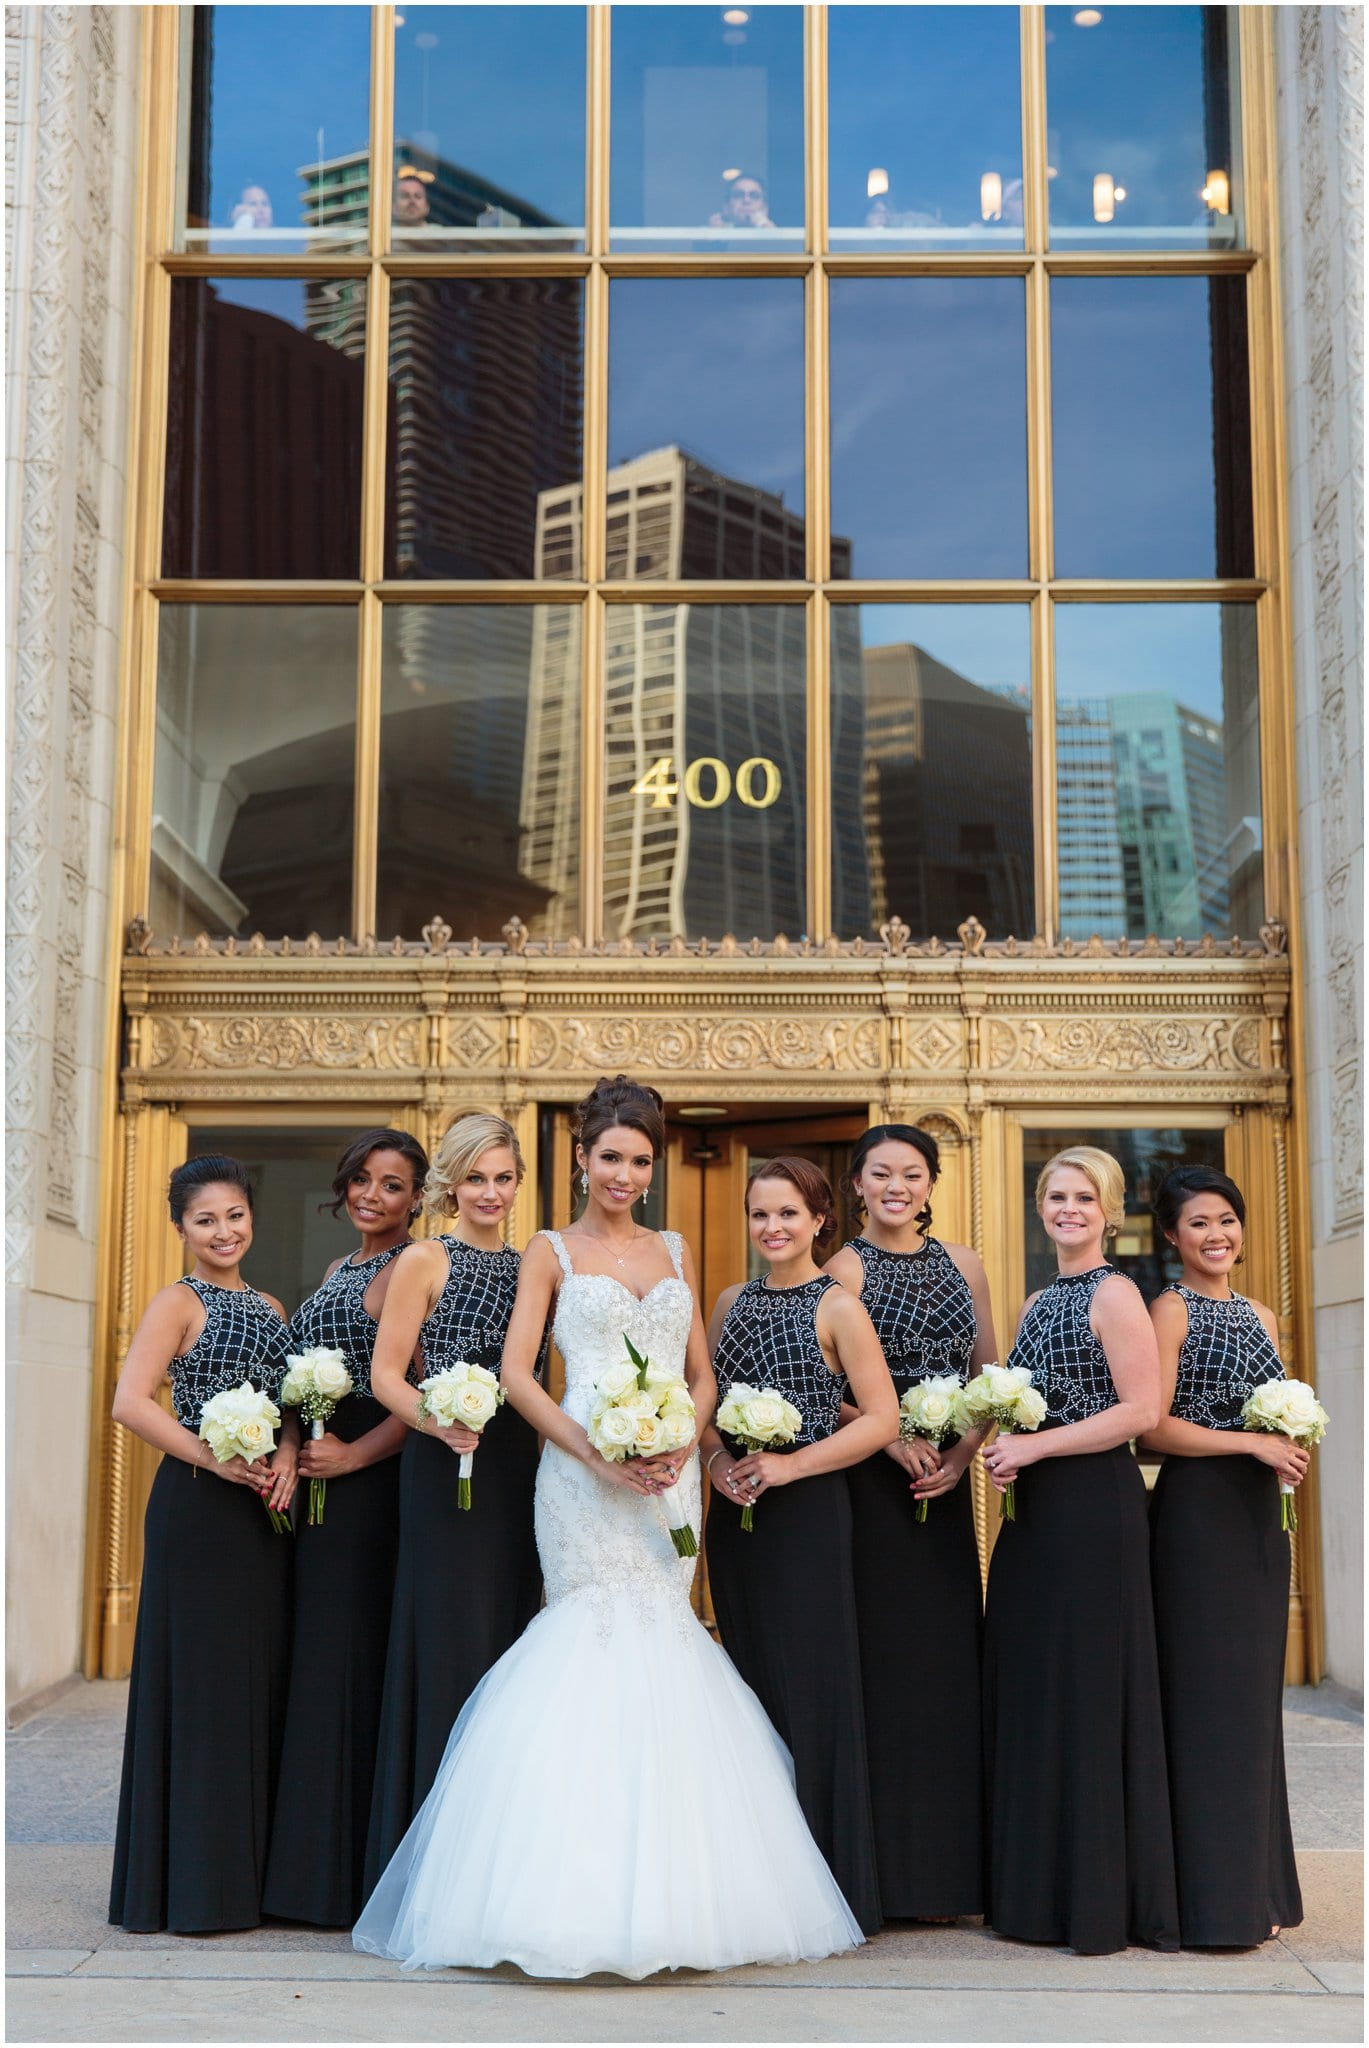 Chicago Riverwalk Wedding Photography - Wes Craft Photography